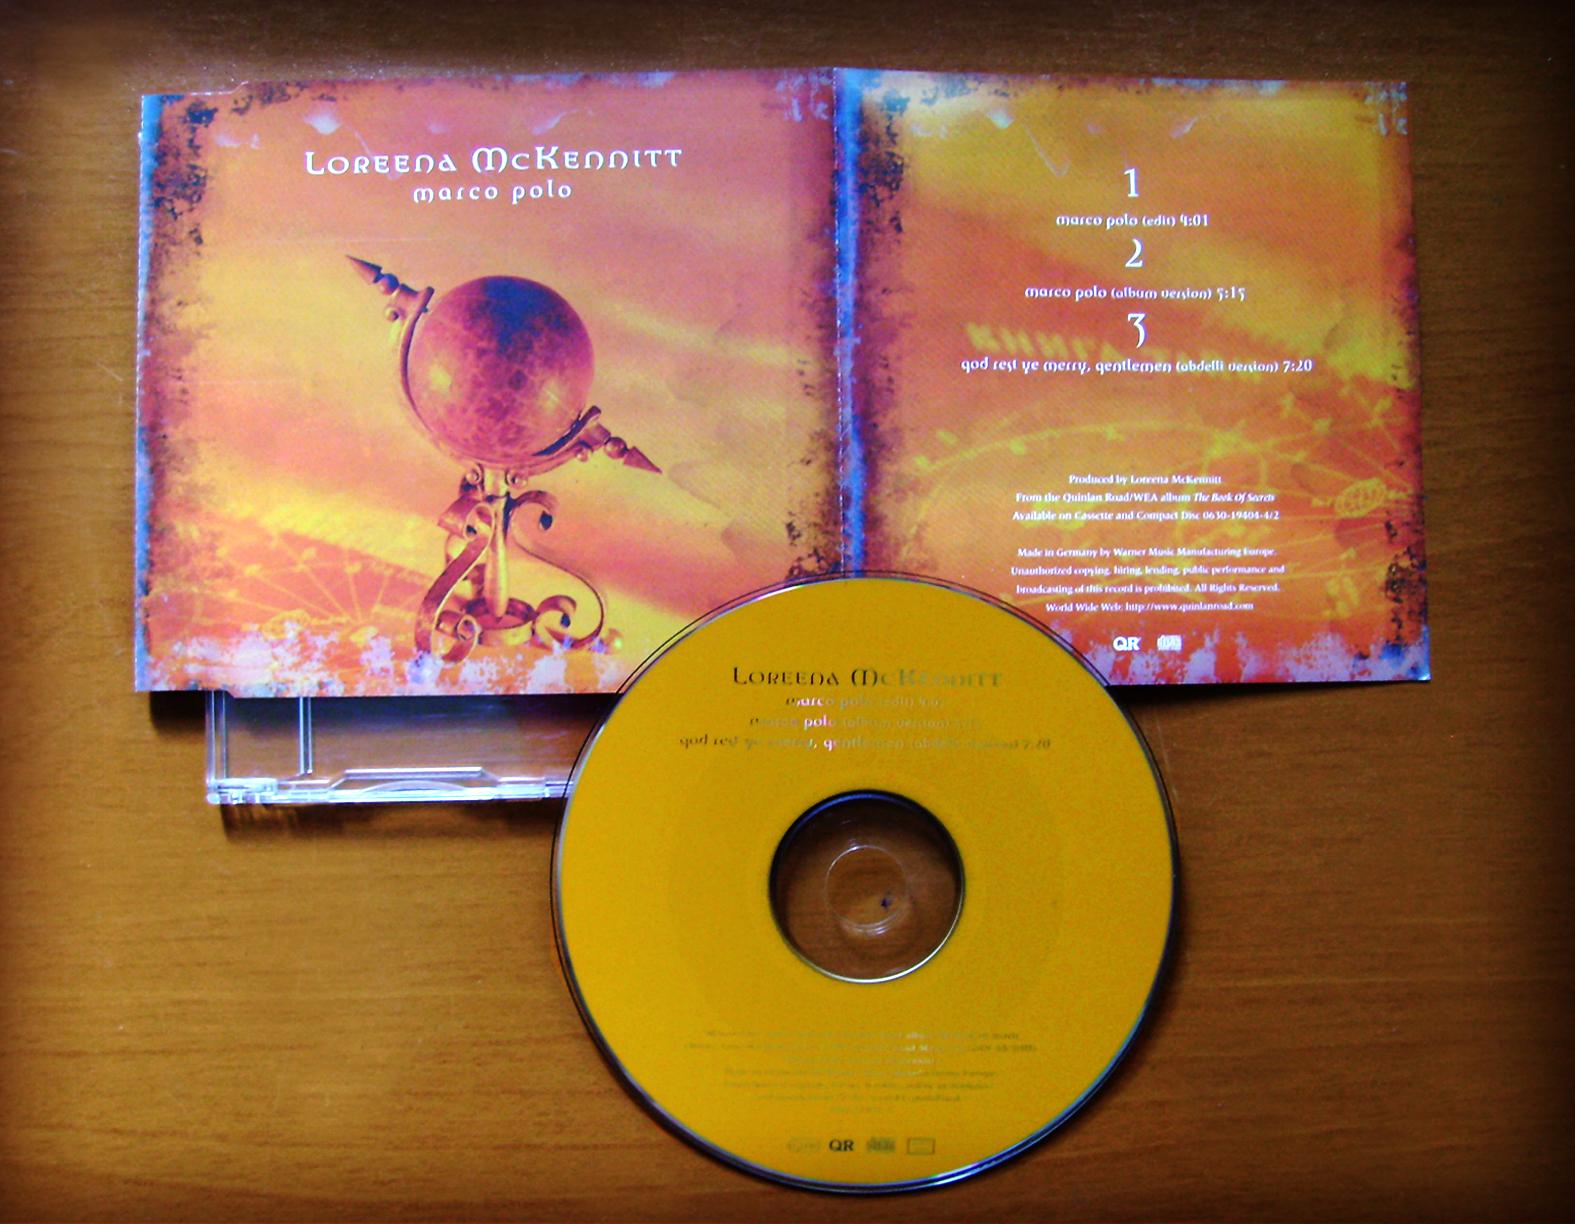 loreena mckennitt collection 1998 marco polo single